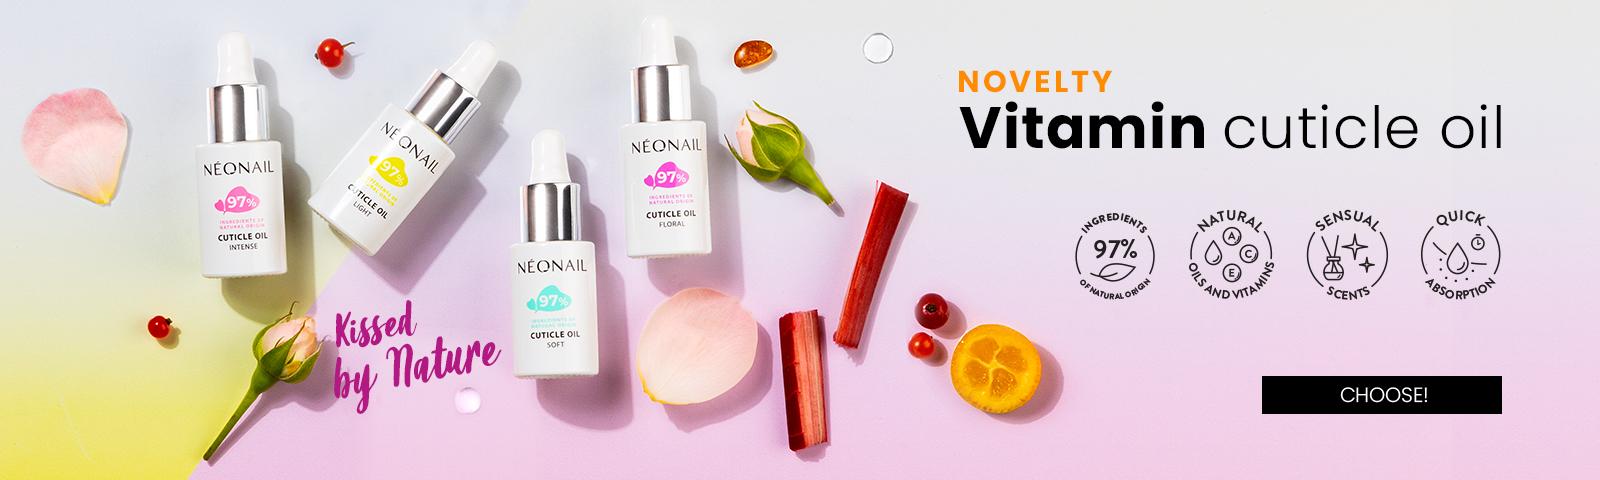 Oliwki witaminowe Vitamin Cuticle OilKissed by Nature  Choose!